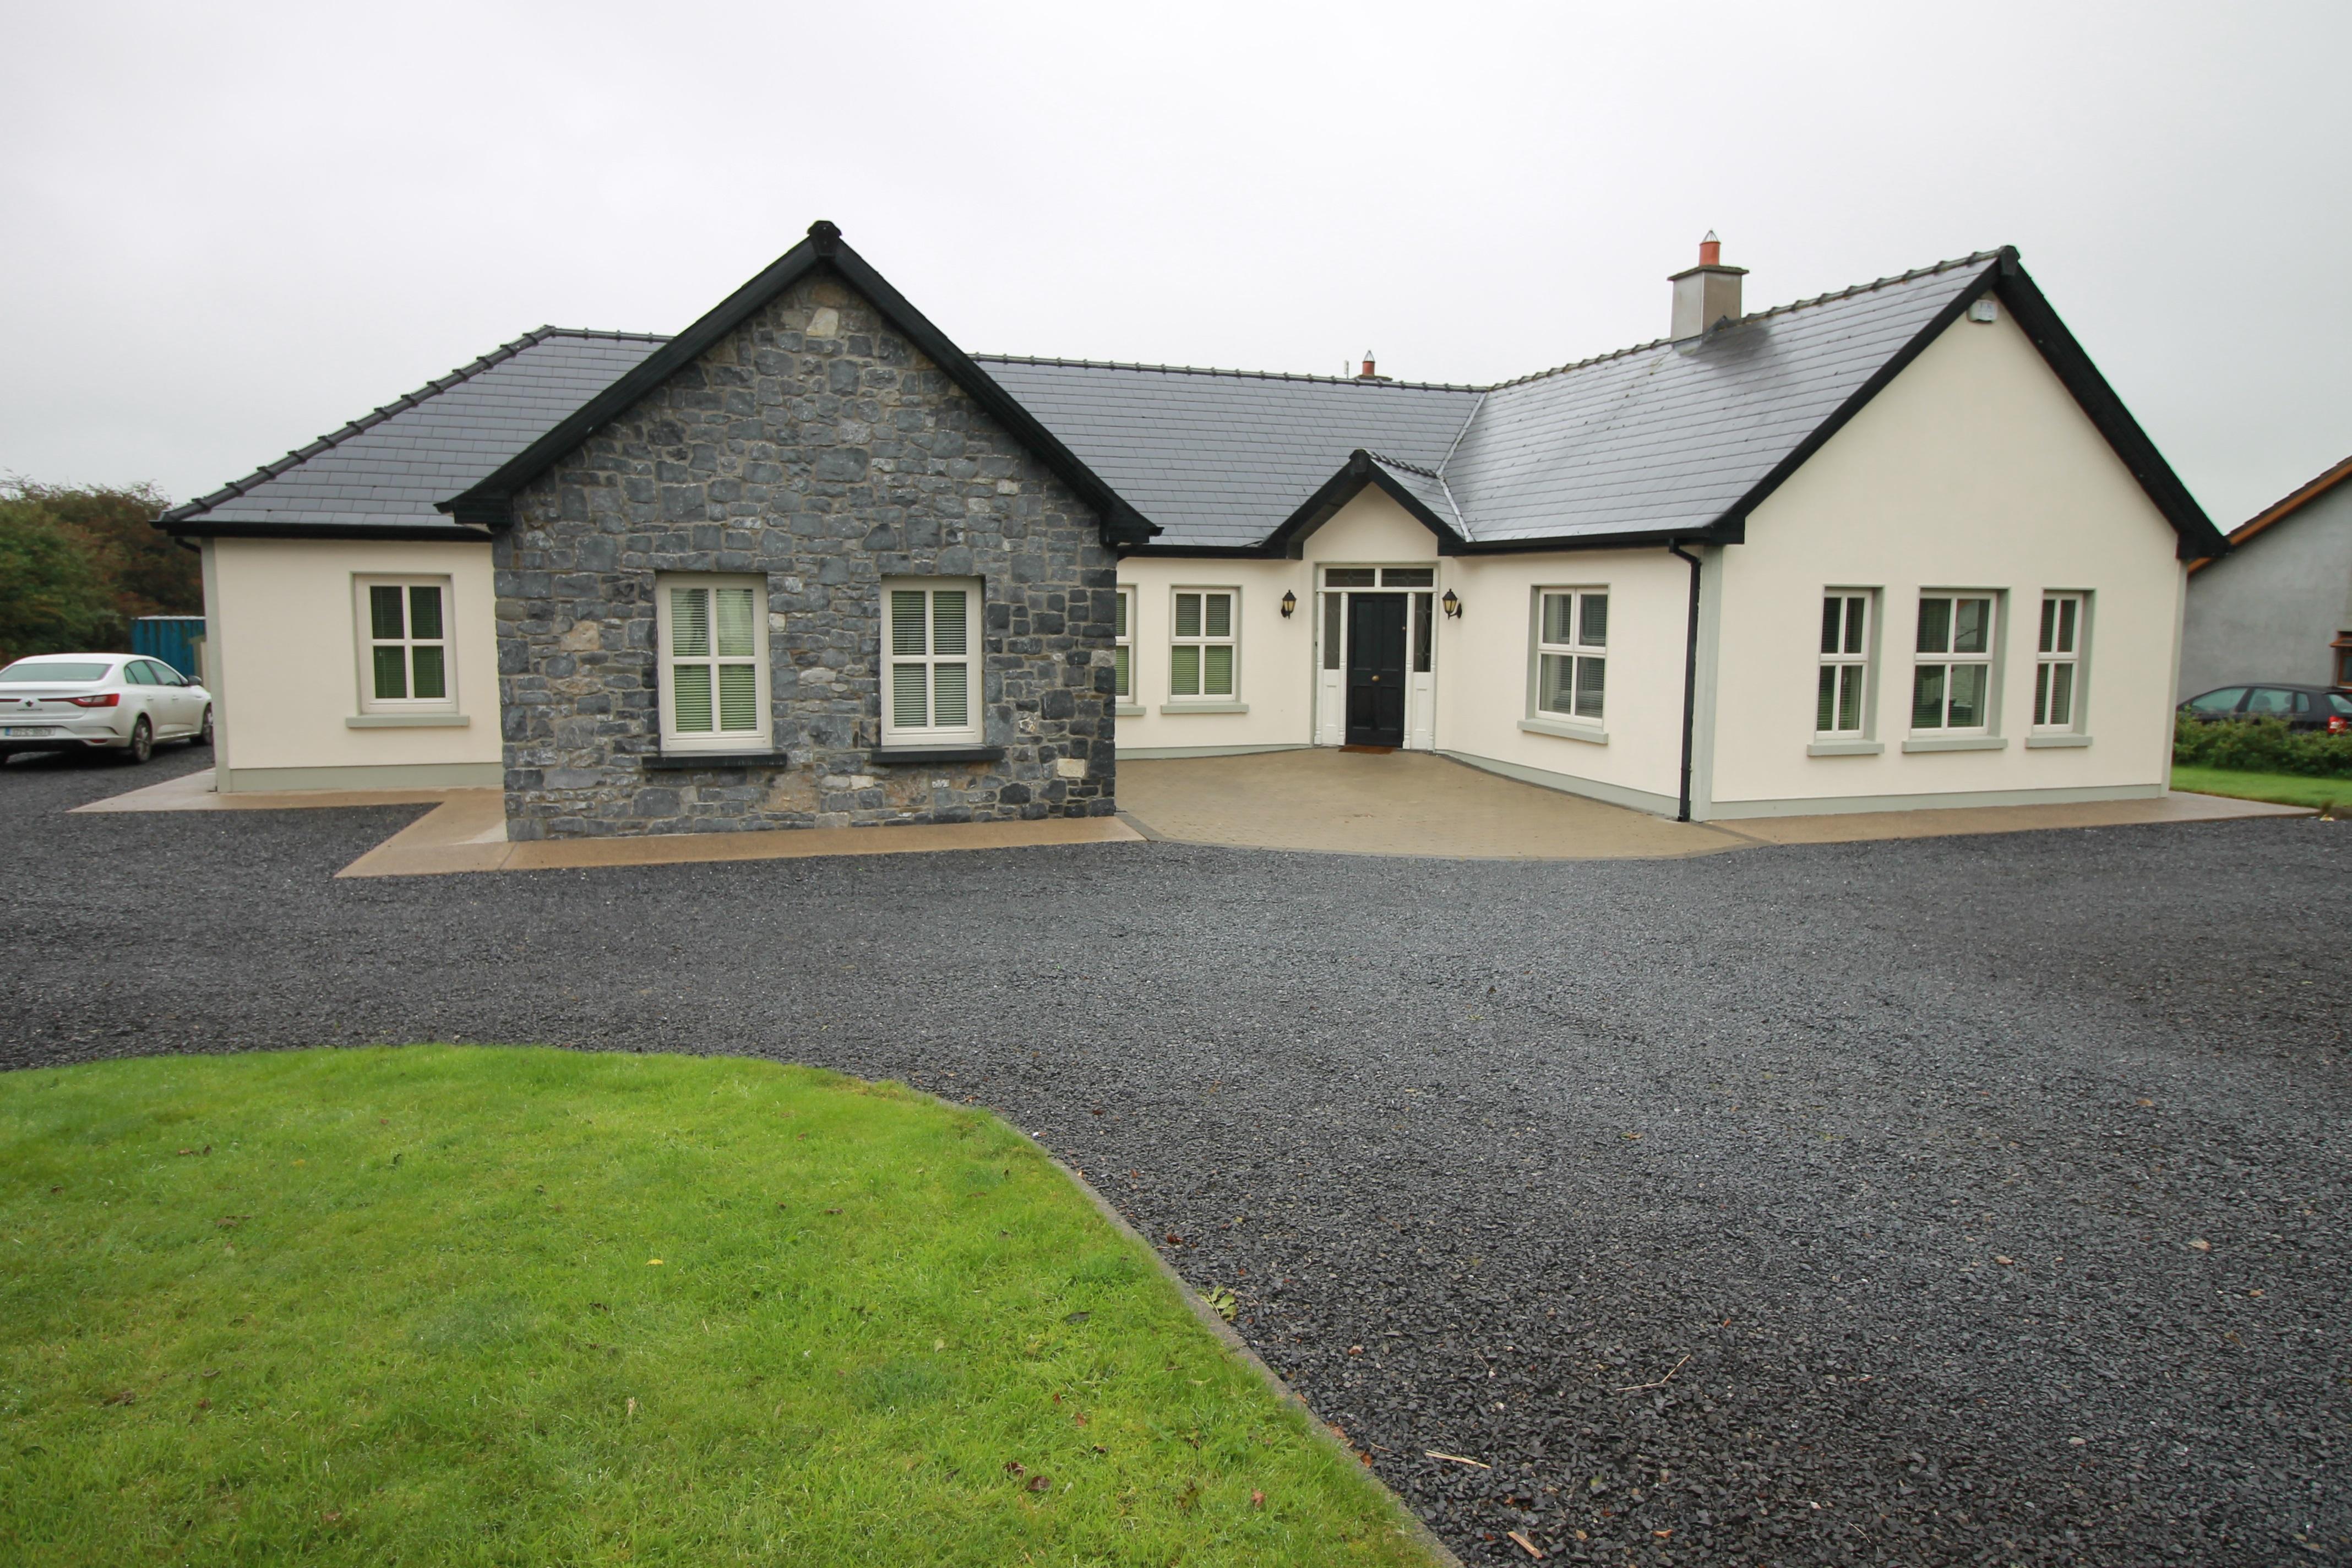 Kilgarriff, Ballylanders, Co. Limerick